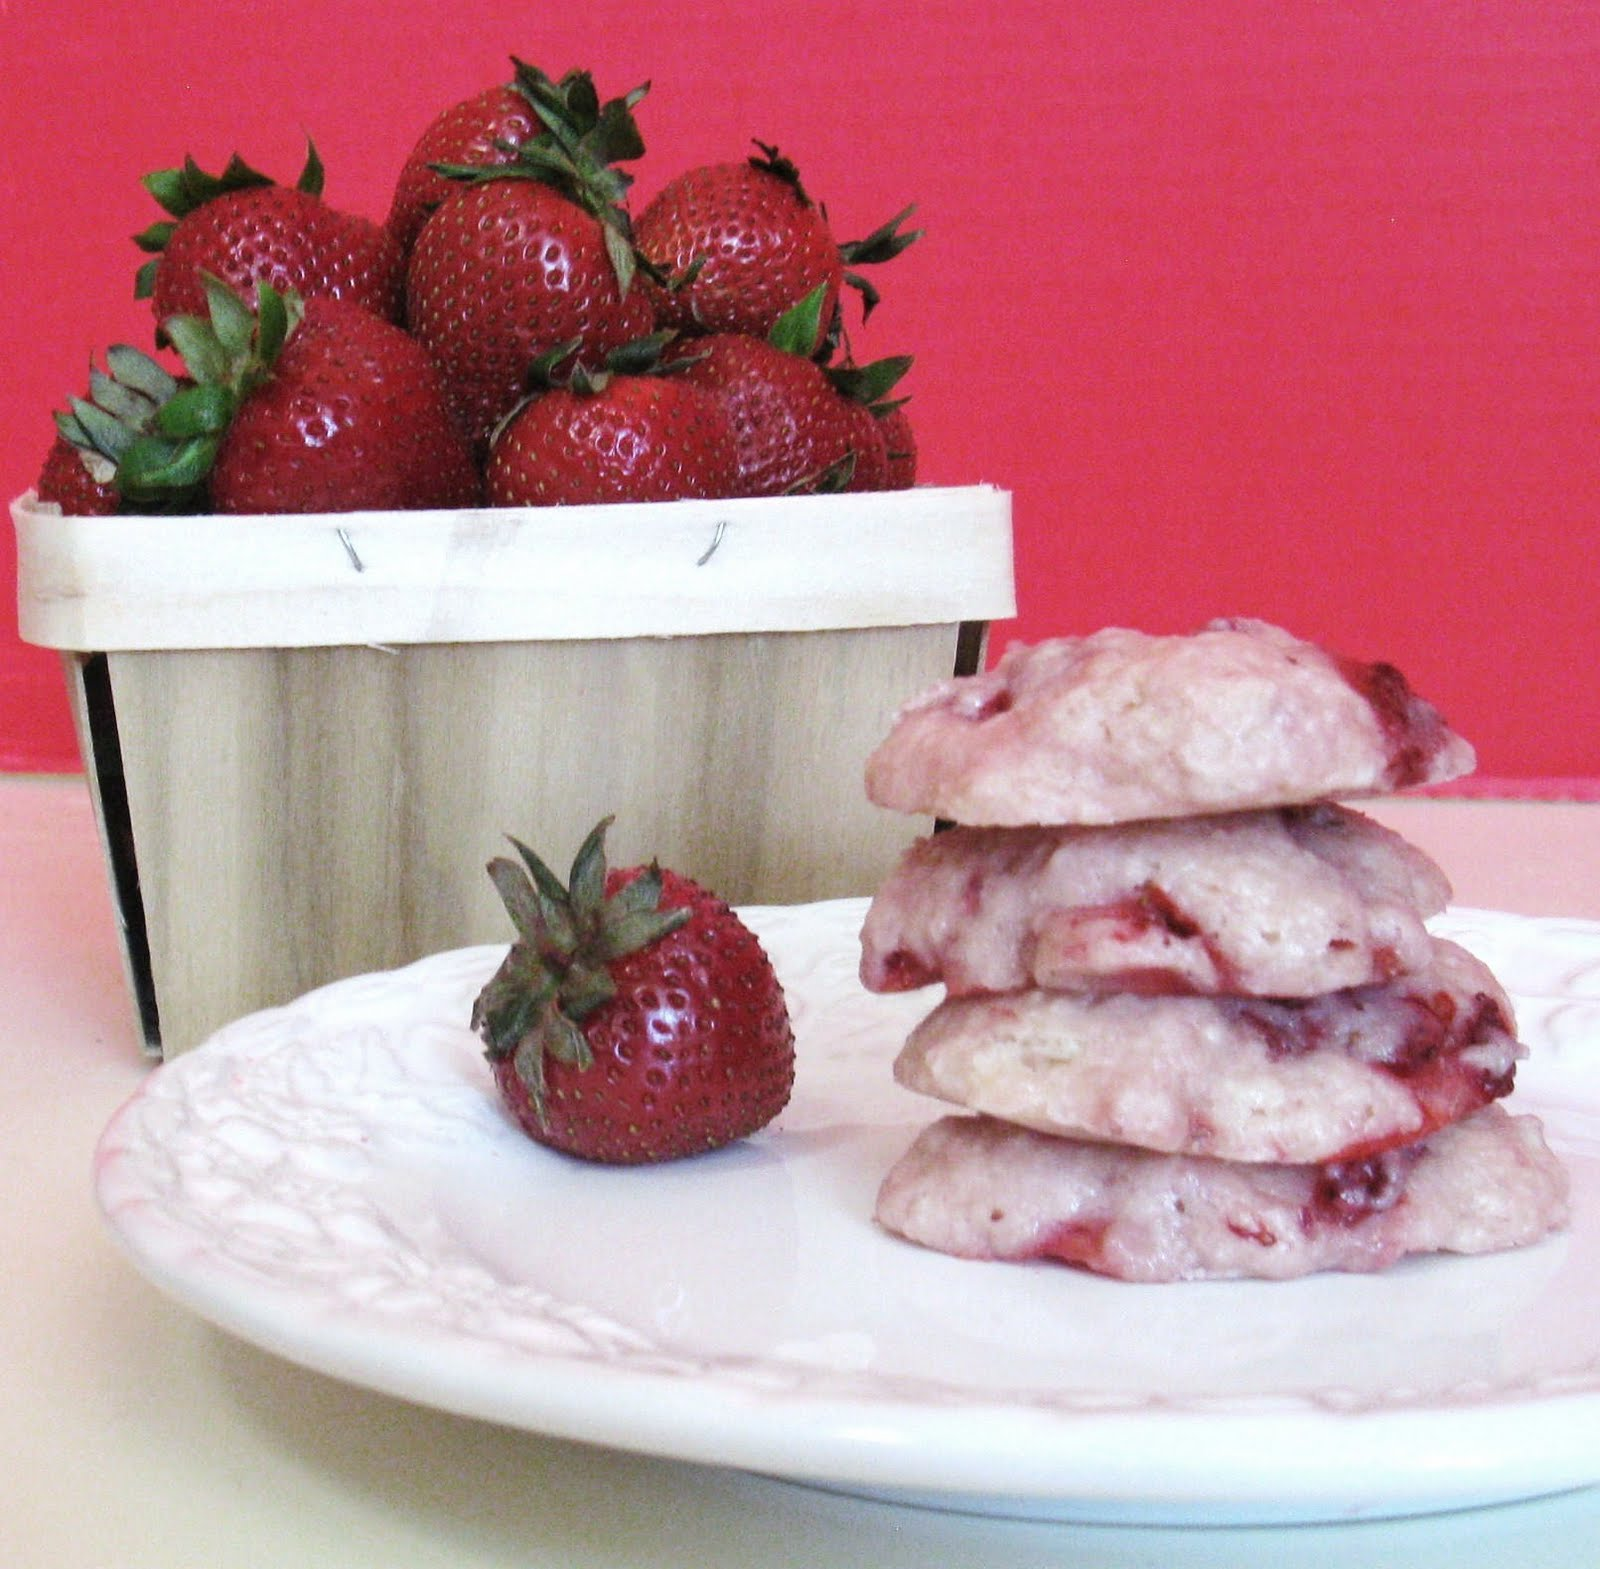 Strawberry-Shortcake Cookies Recipe — Dishmaps